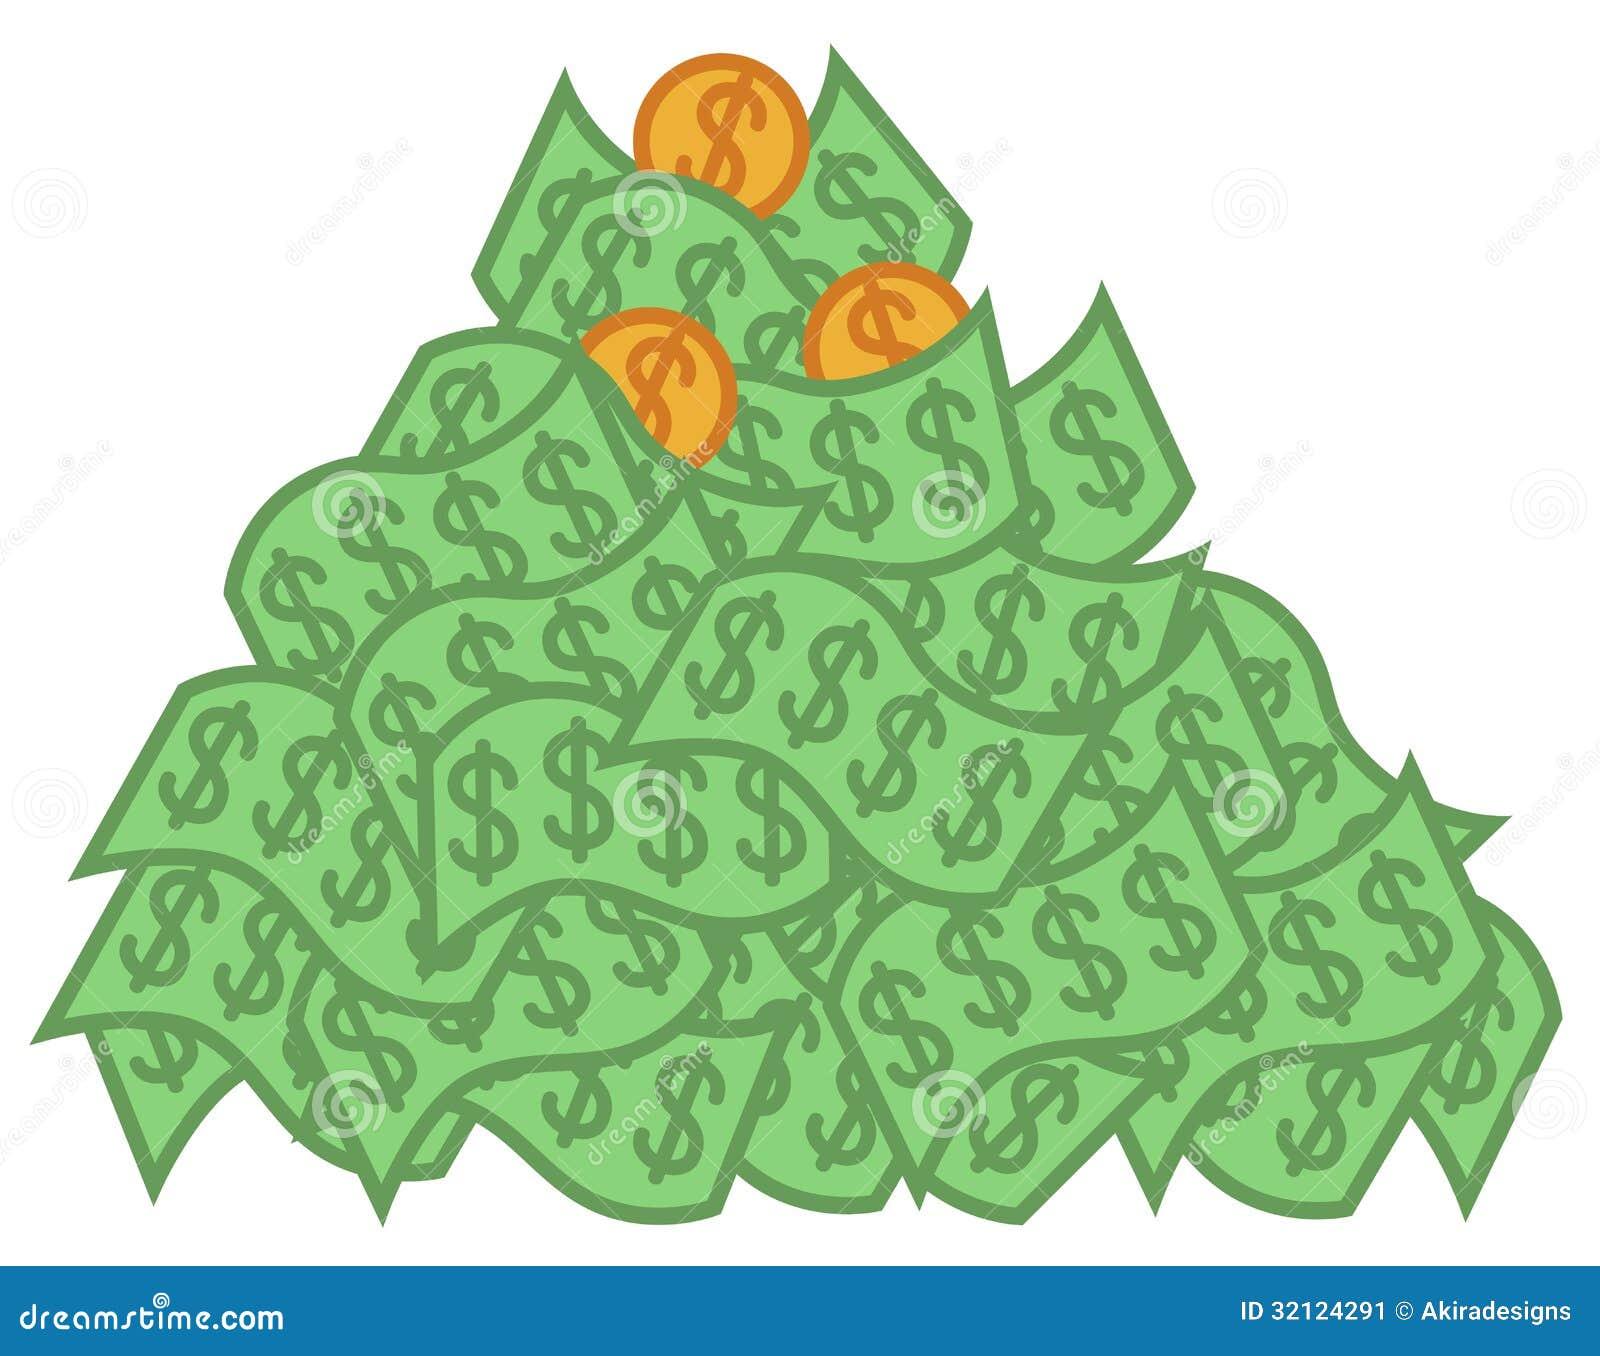 pile of money clipart - photo #6